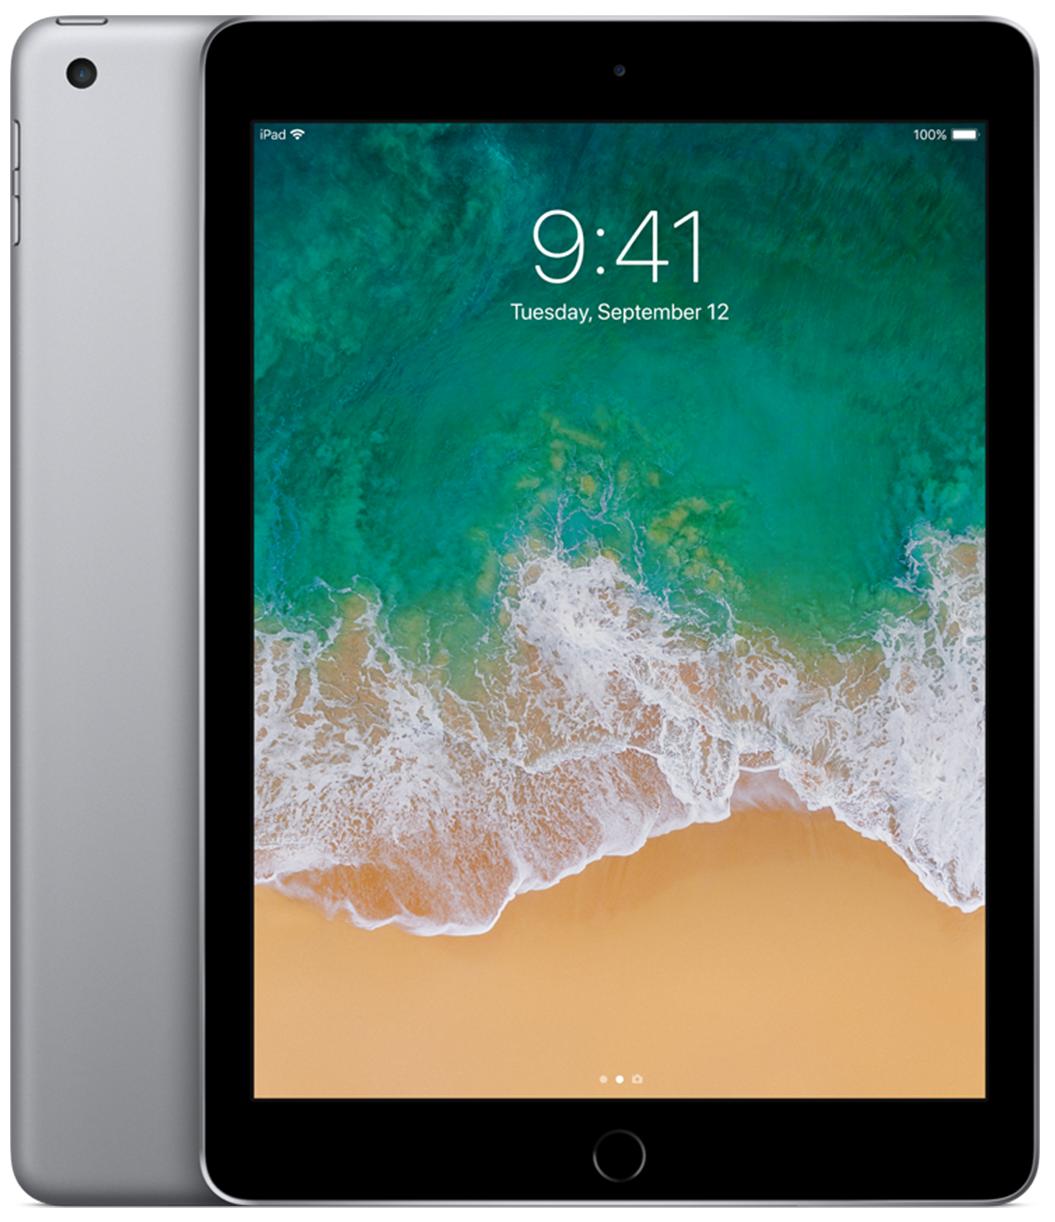 Apple iPad 5 (2017) - 32GB - 4G - Space Gray - A Grade